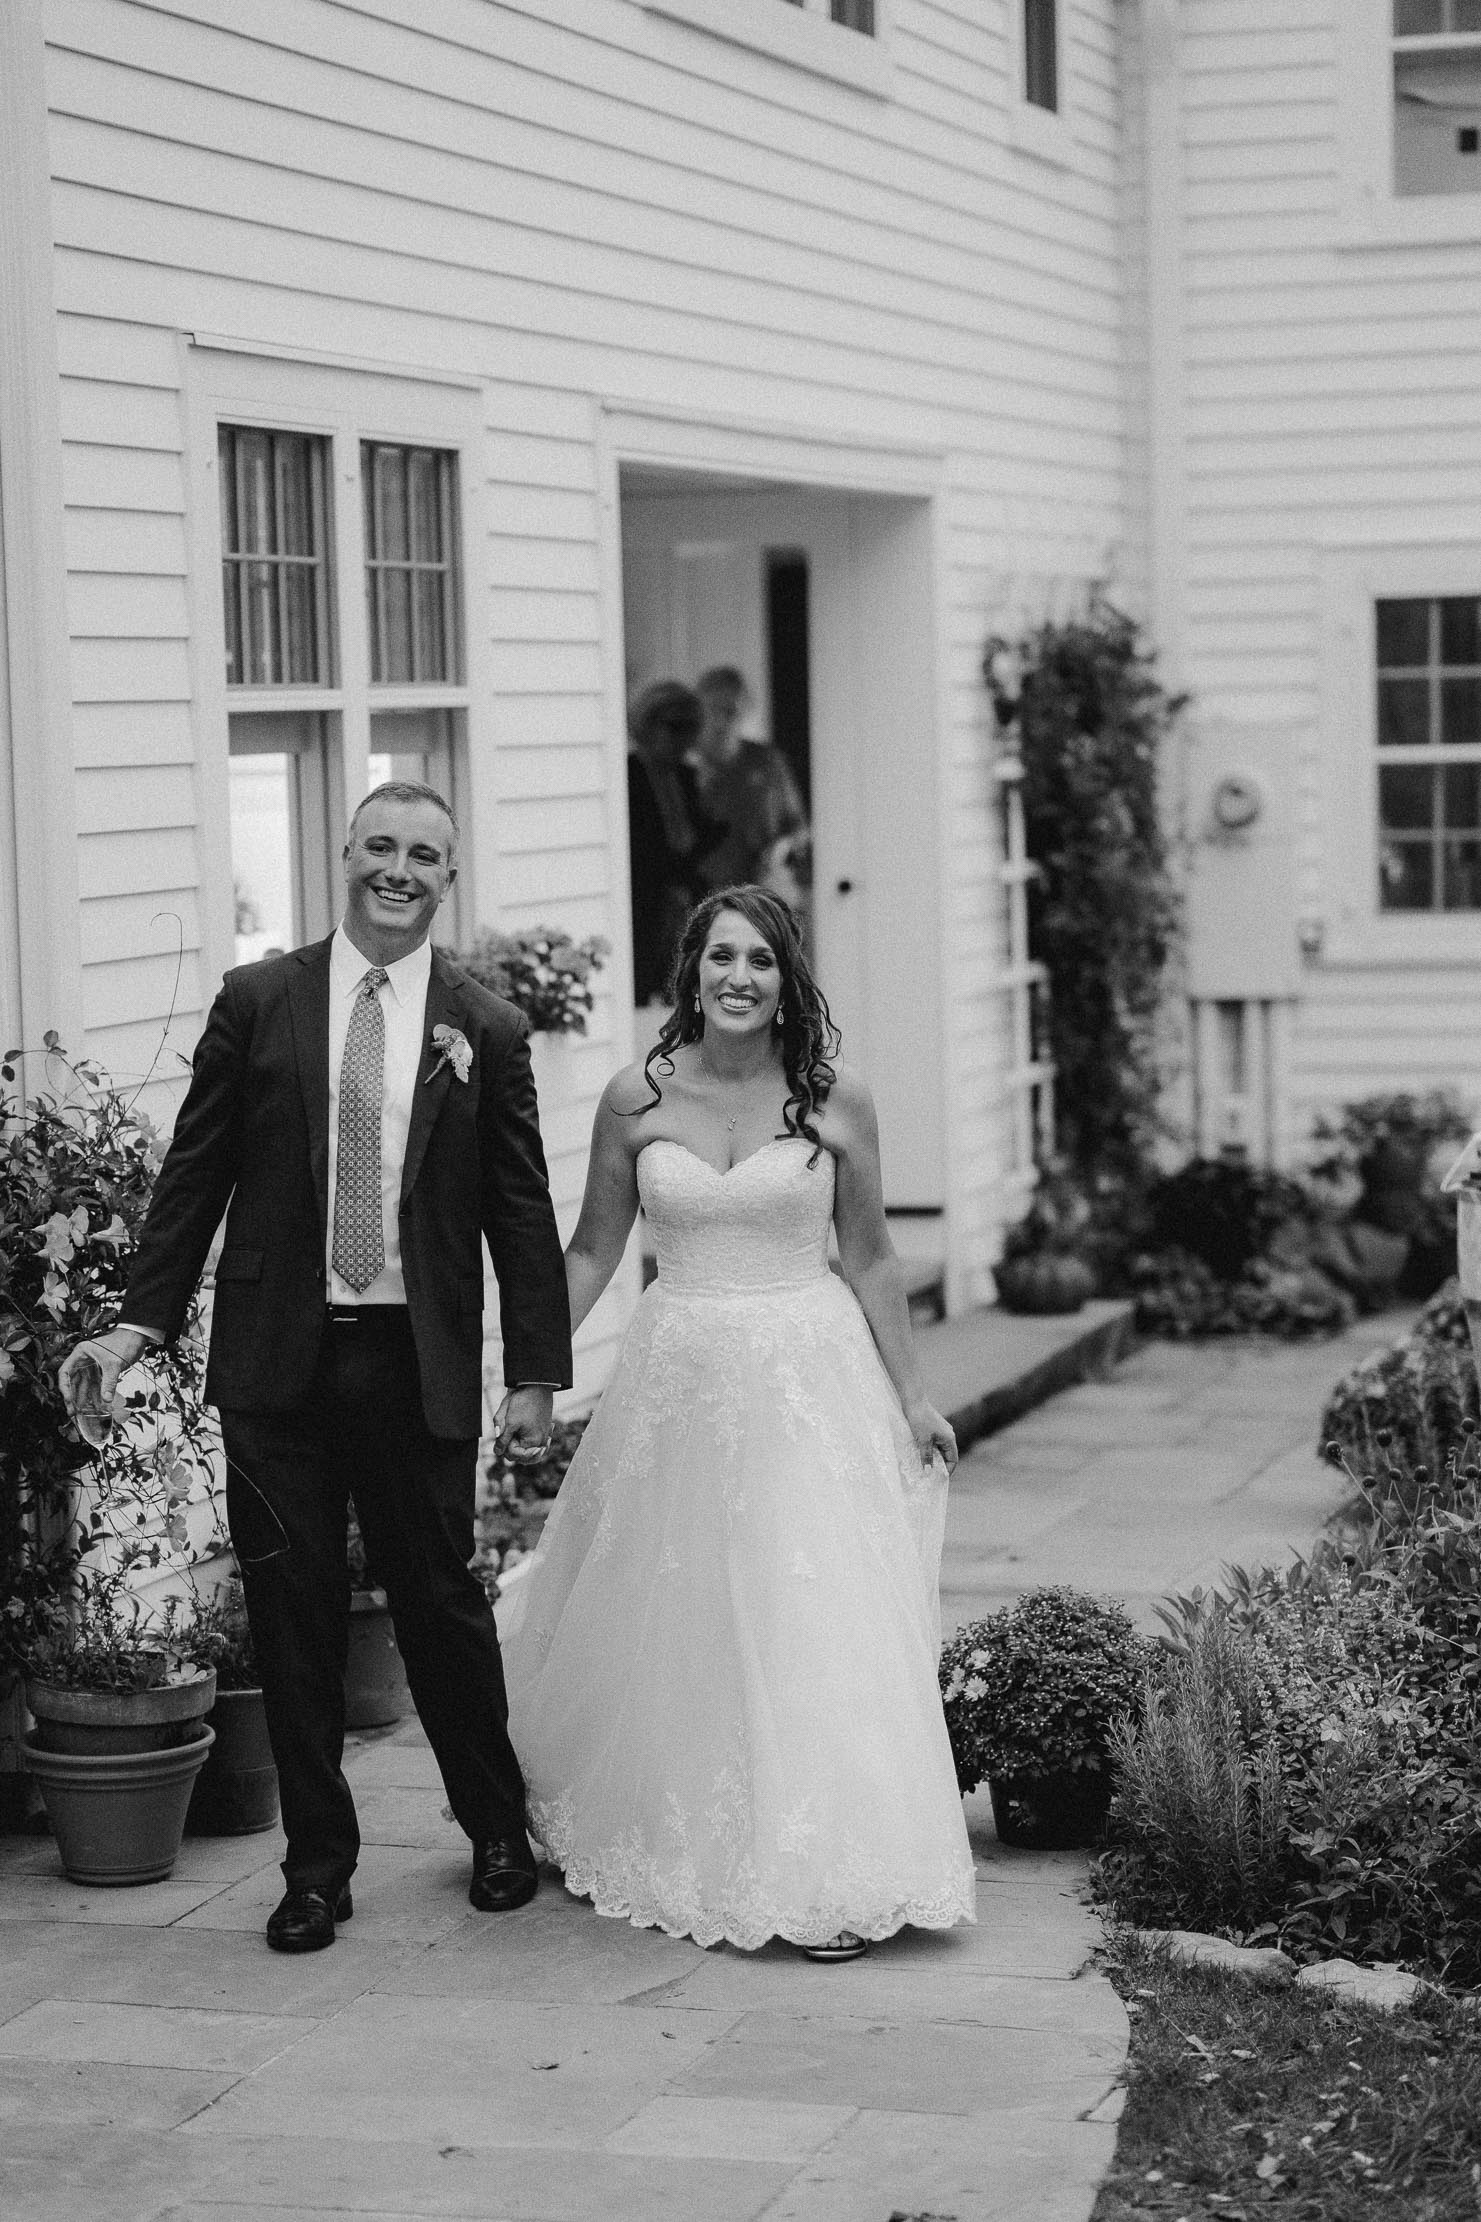 Wings-Castle-Millbrook-NY-Upstate-Wedding-Photographer-1125.jpg